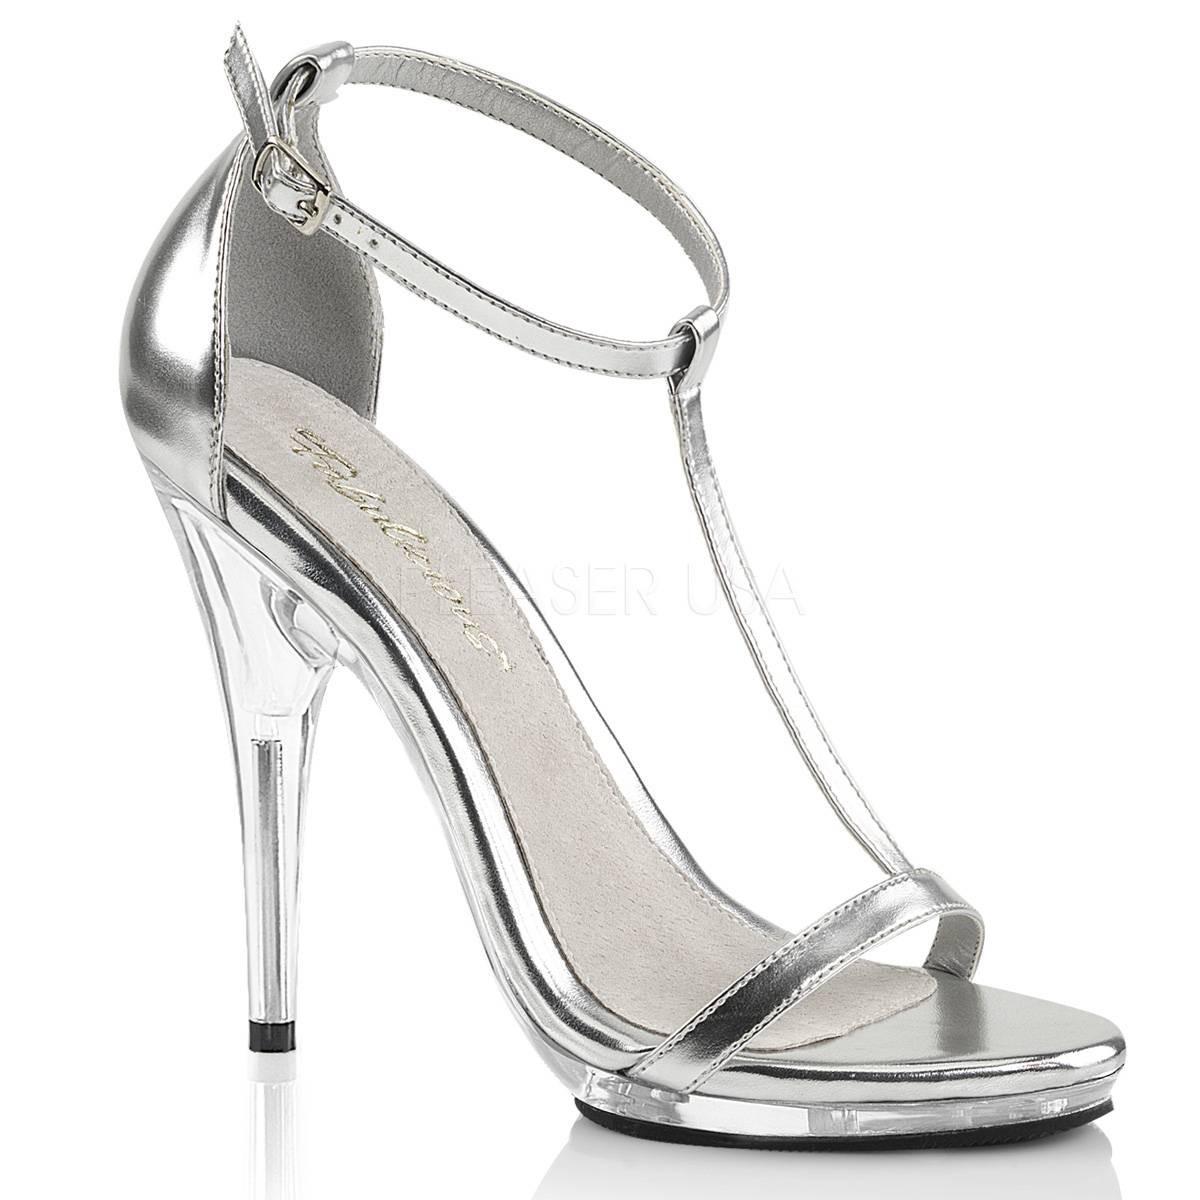 Sandalen - POISE 526 ° Damen Sandalette ° SilberMatt ° Fabulicious  - Onlineshop RedSixty